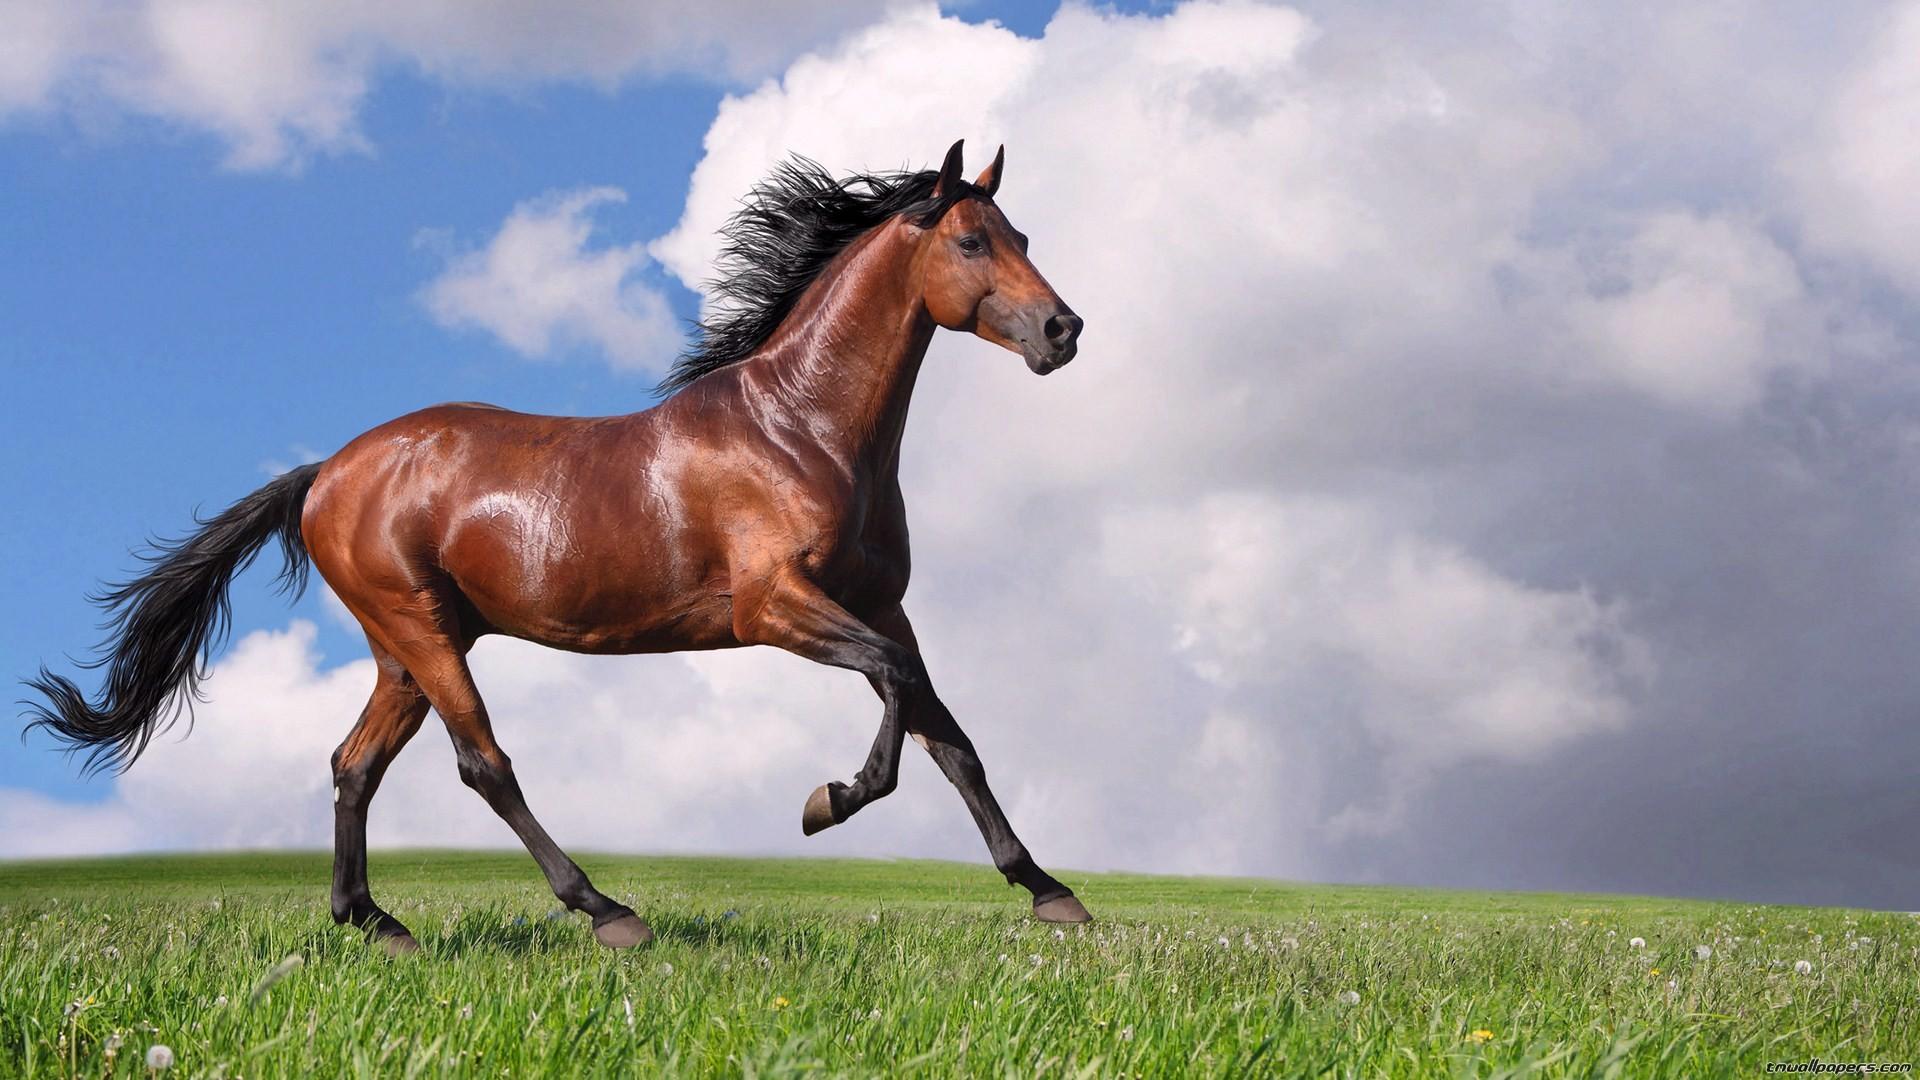 Sfondi cavalli 54 immagini for Sfondi animali hd